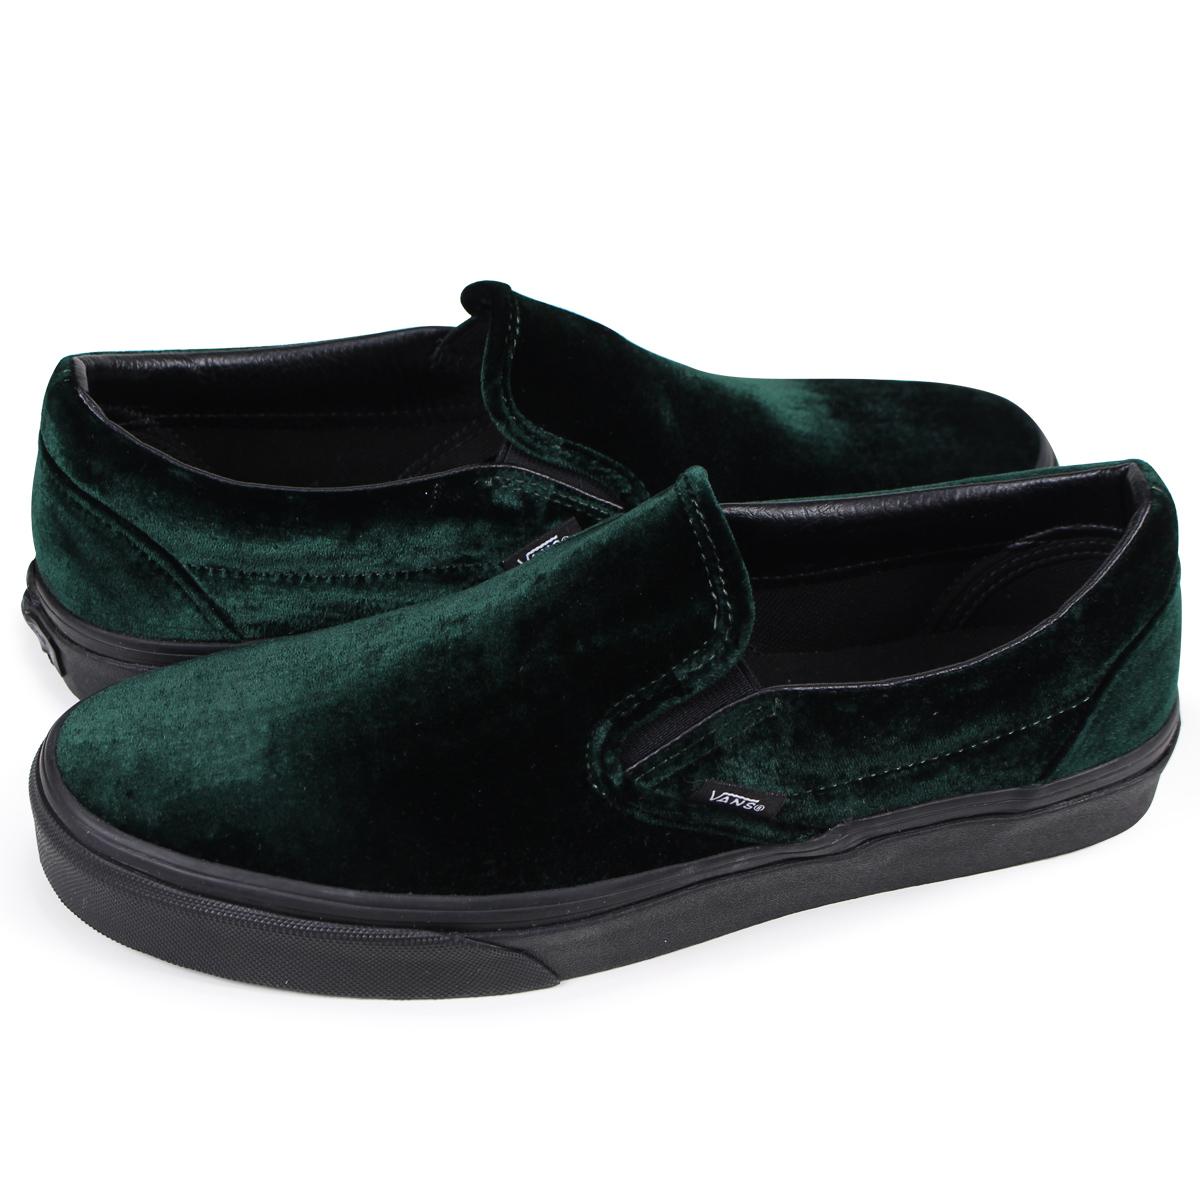 5e6e24ba45 VANS CLASSIC SLIP-ON slip-ons sneakers men gap Dis vans station wagons  VN0A38F7QU0 green